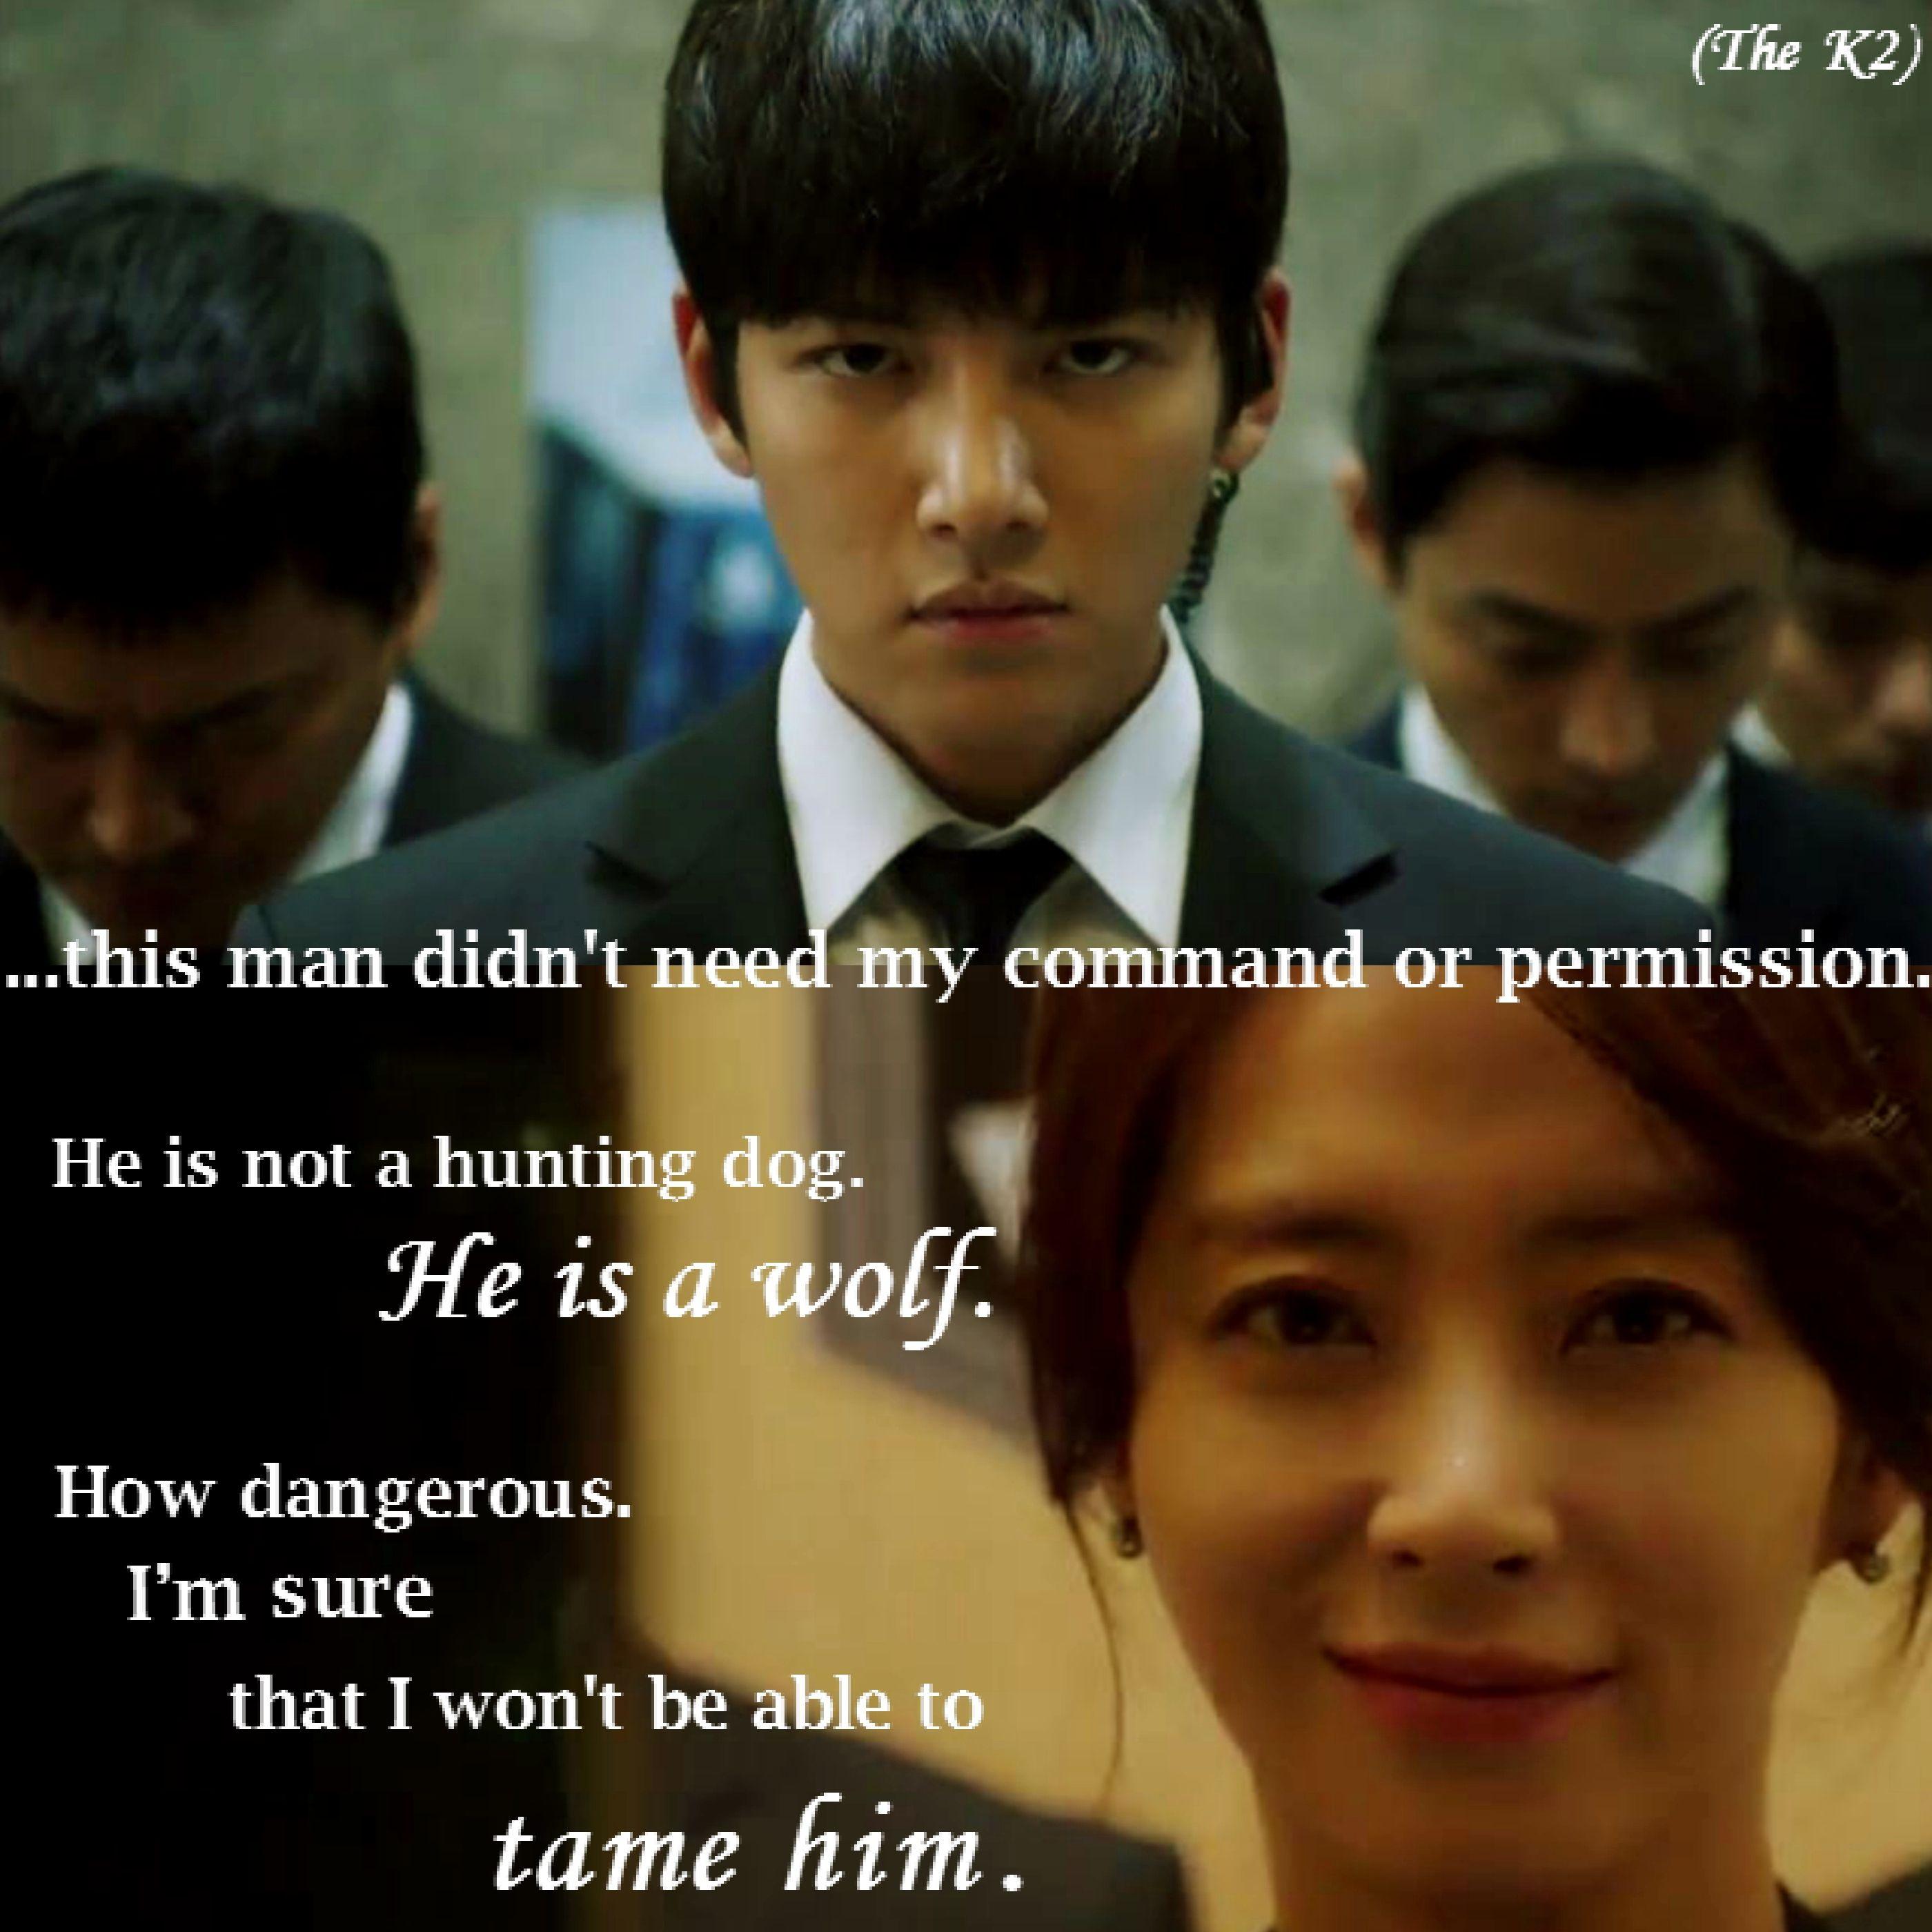 the k kdramaquote k kimjeha korean drama quotes kdrama